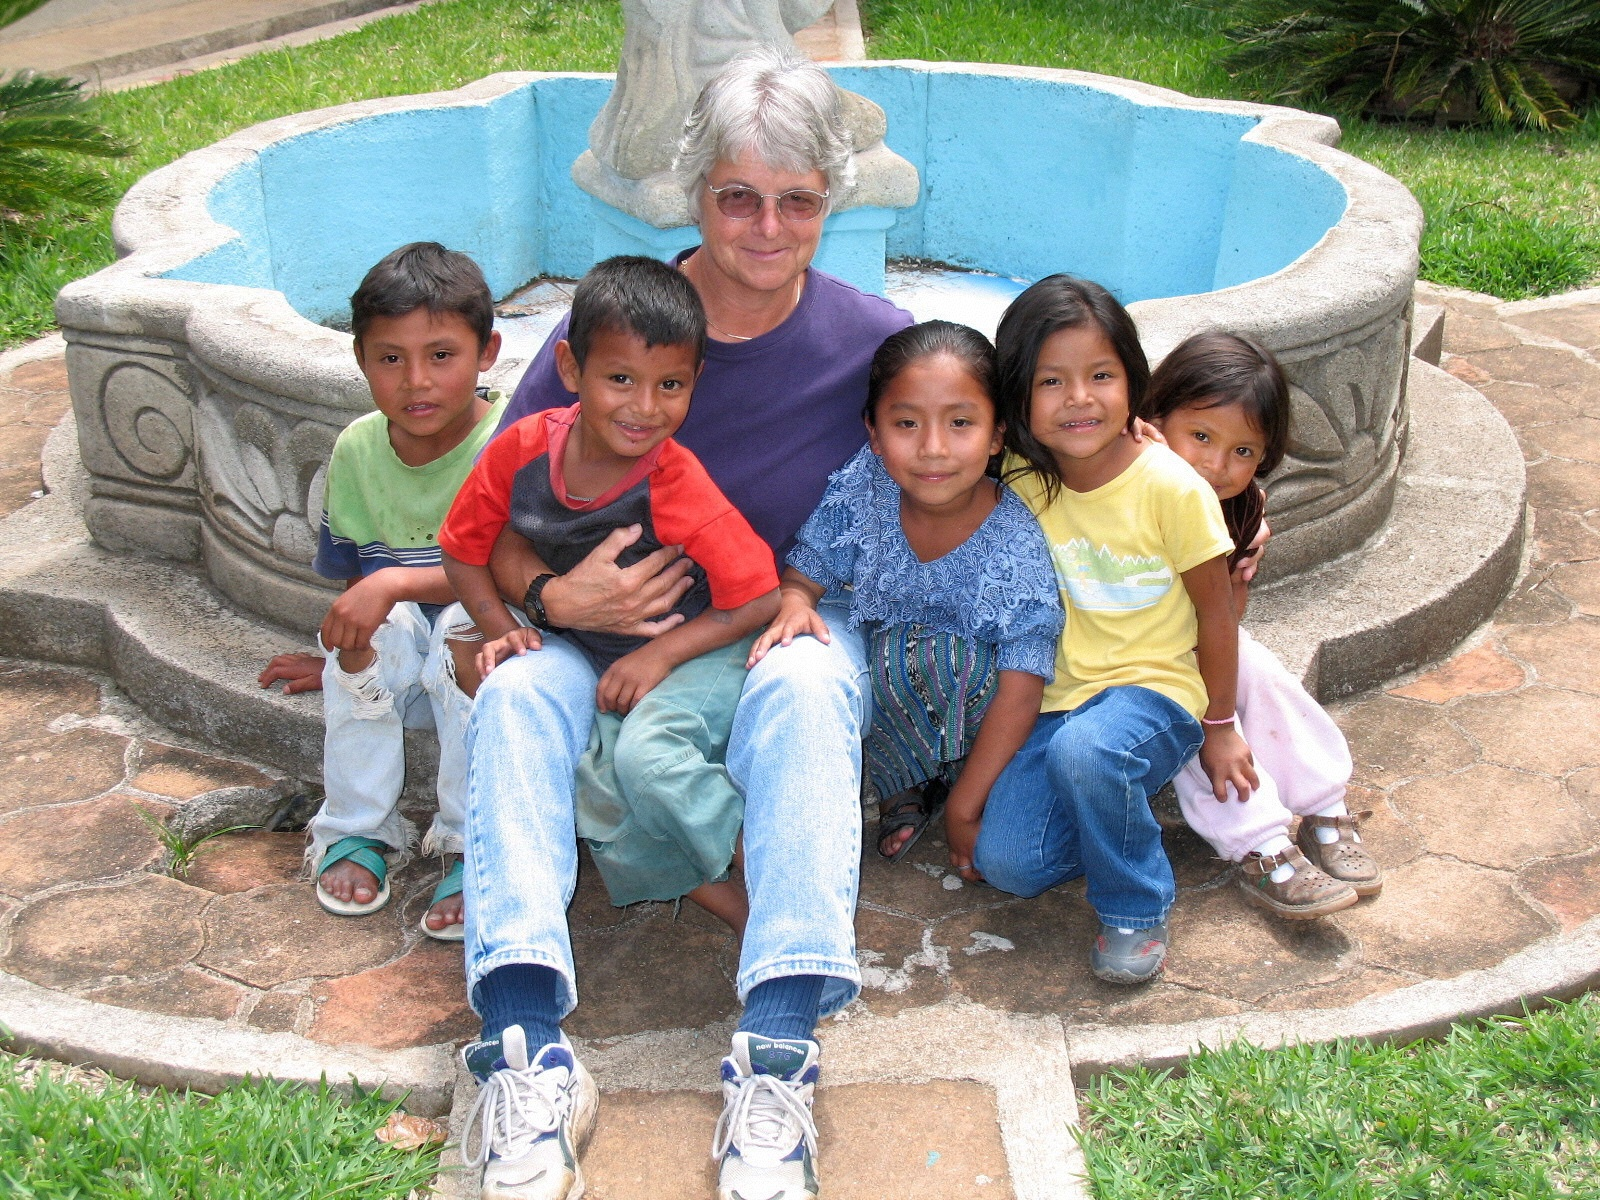 Barb Pallari making new friends on an RWF humanitarian aid trip.